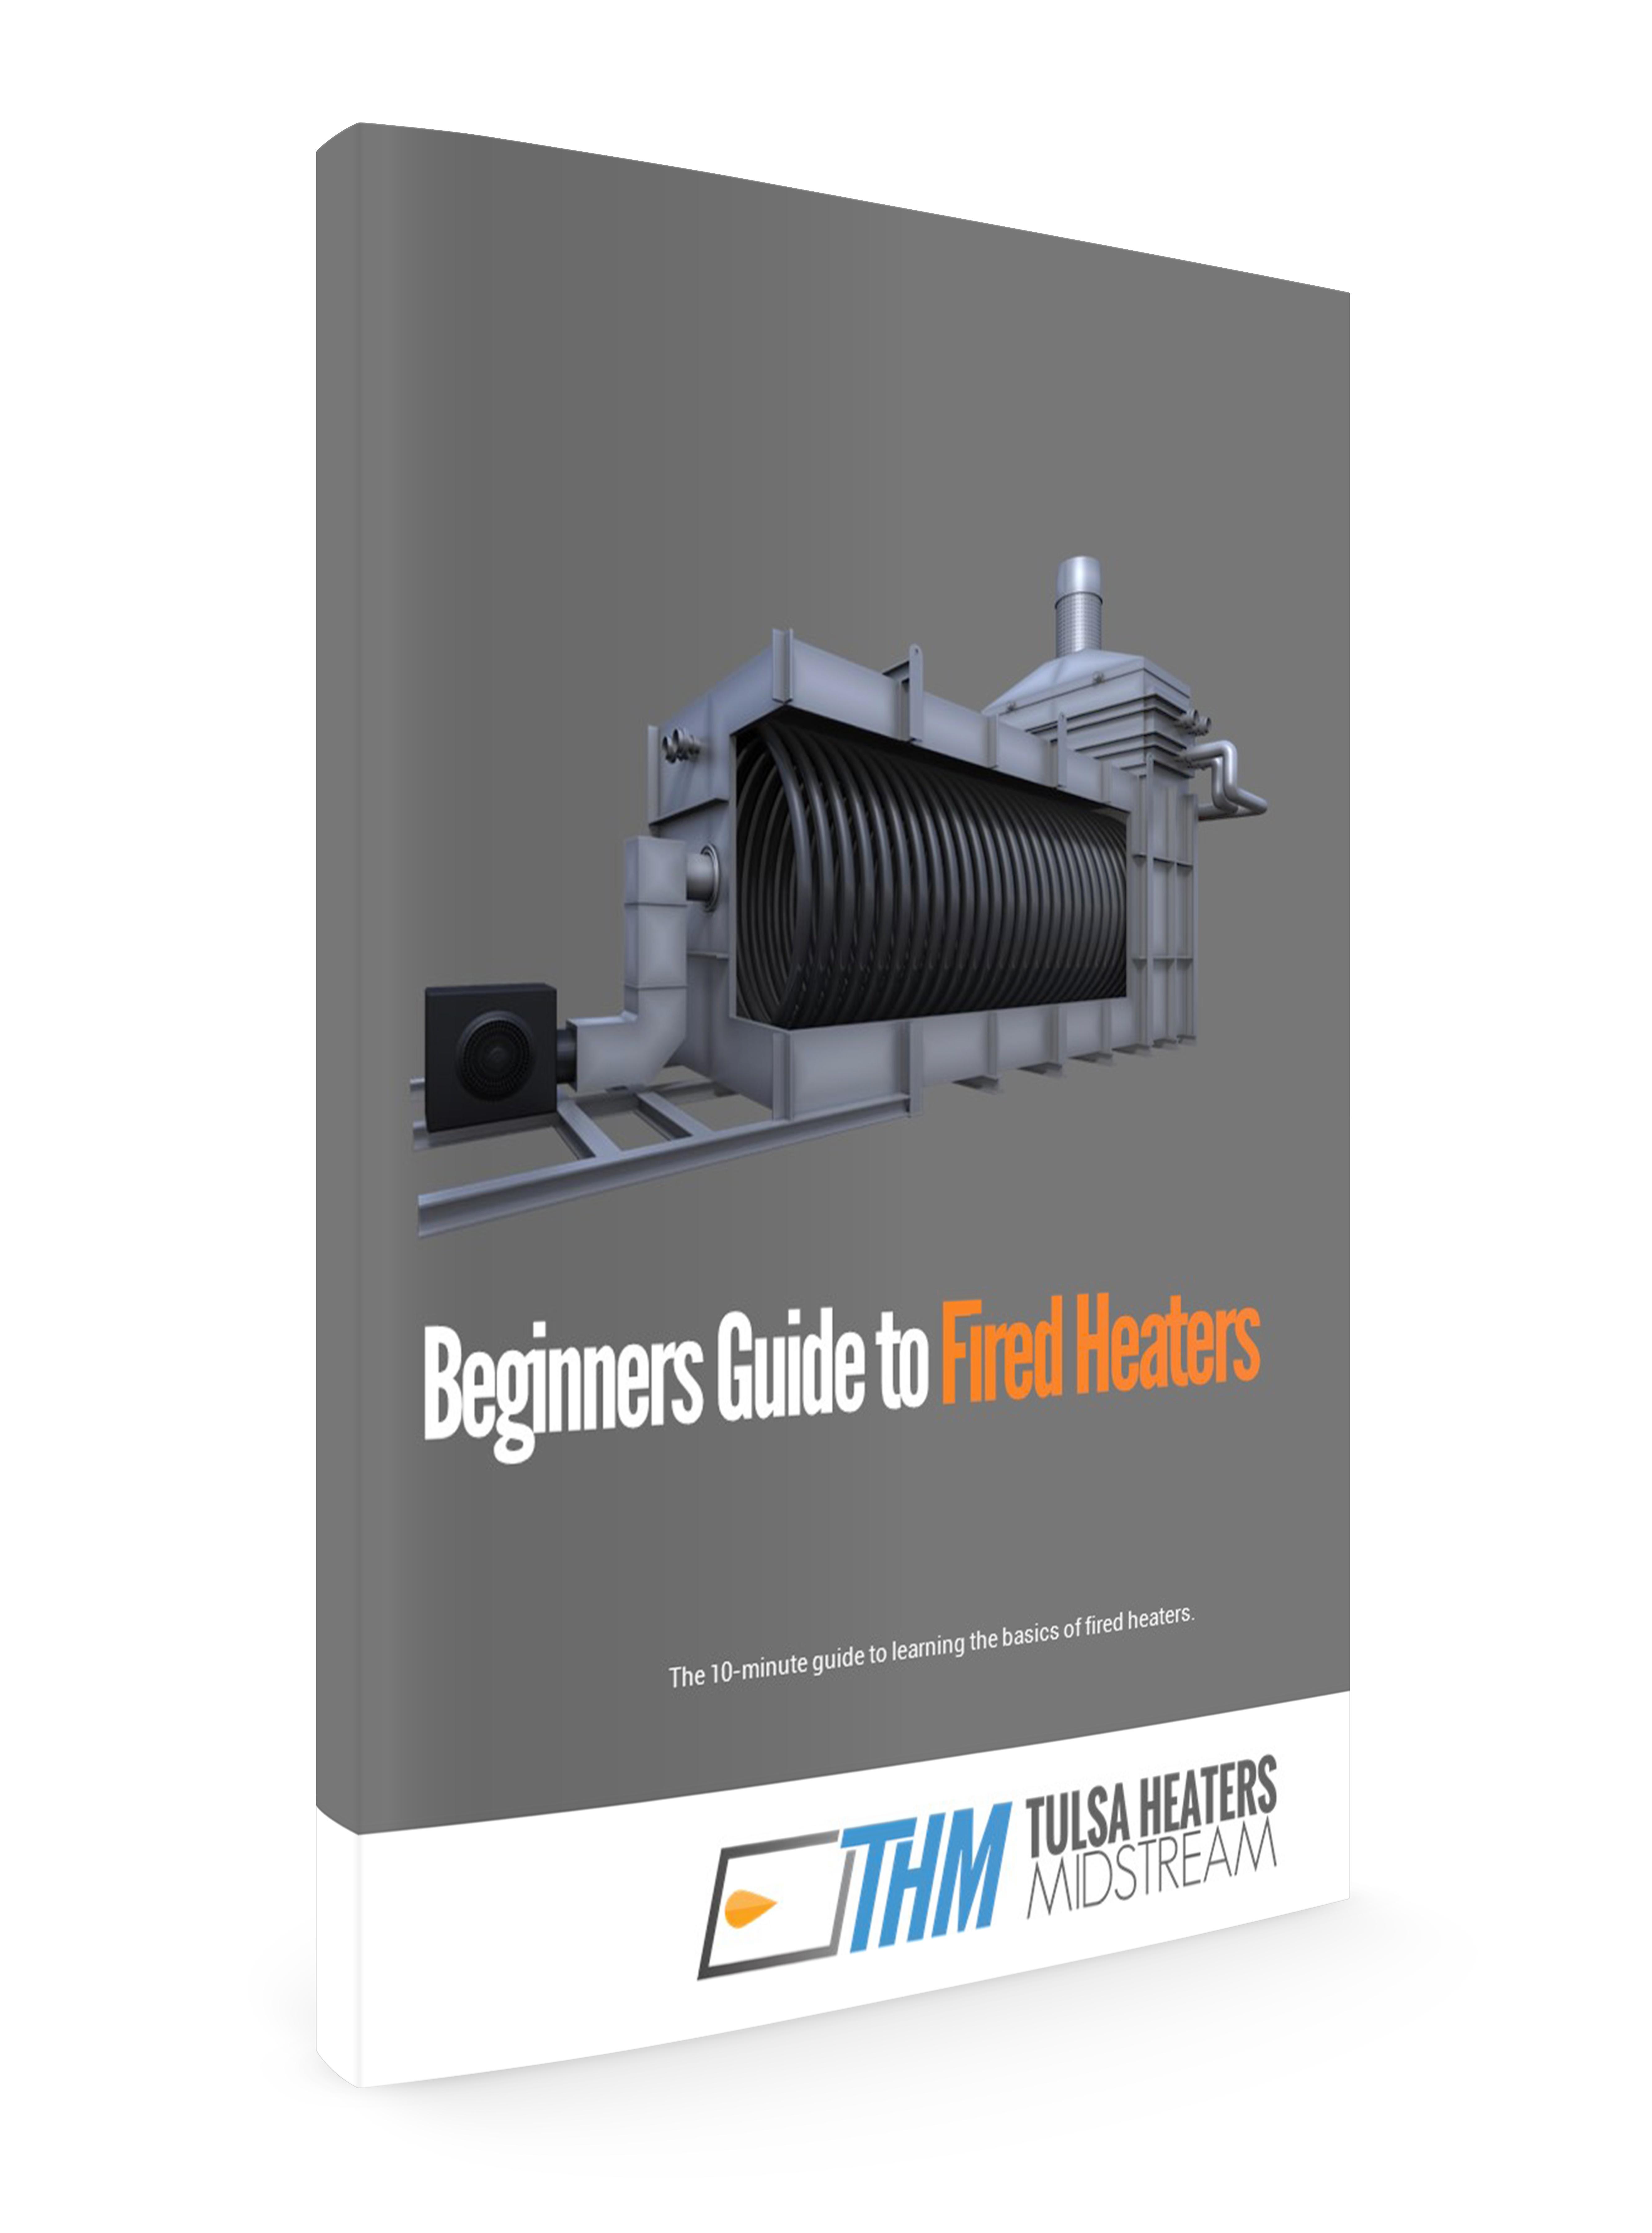 Beginners_Guide_to_Fired_Heaters_Ebook_Mockup.jpg